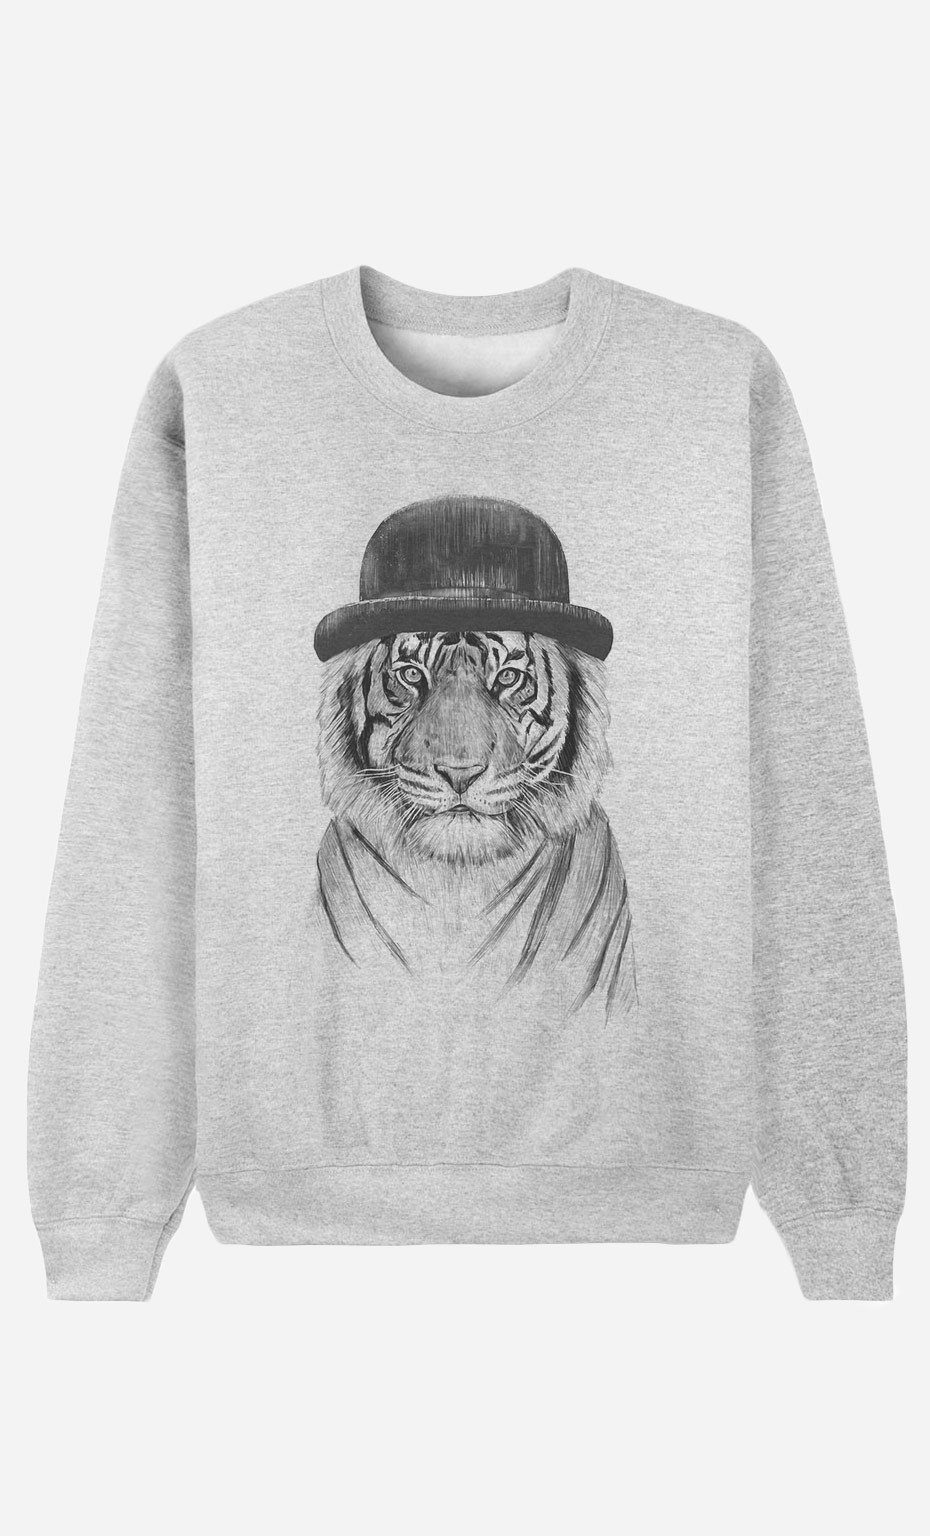 Sweatshirt Welcome To The Jungle